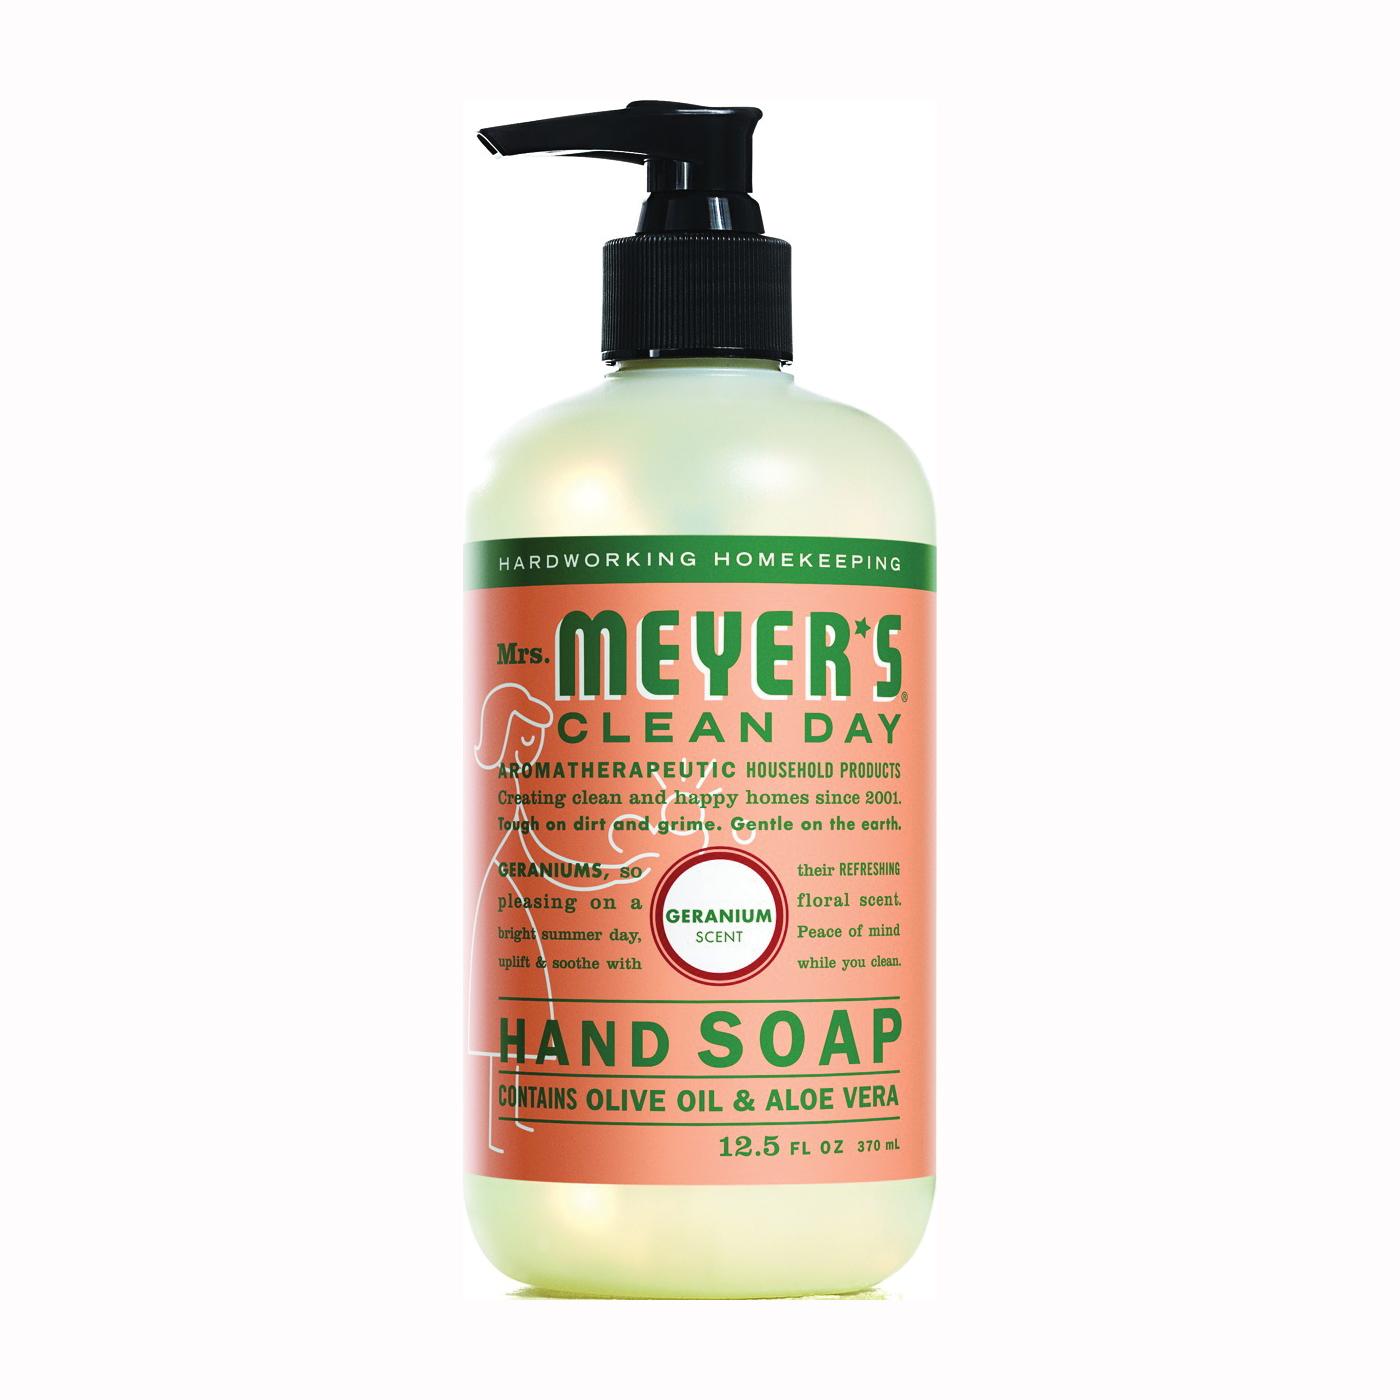 Picture of Mrs. Meyer's 13104 Hand Soap, Liquid, Geranium, 12.5 oz Package, Bottle